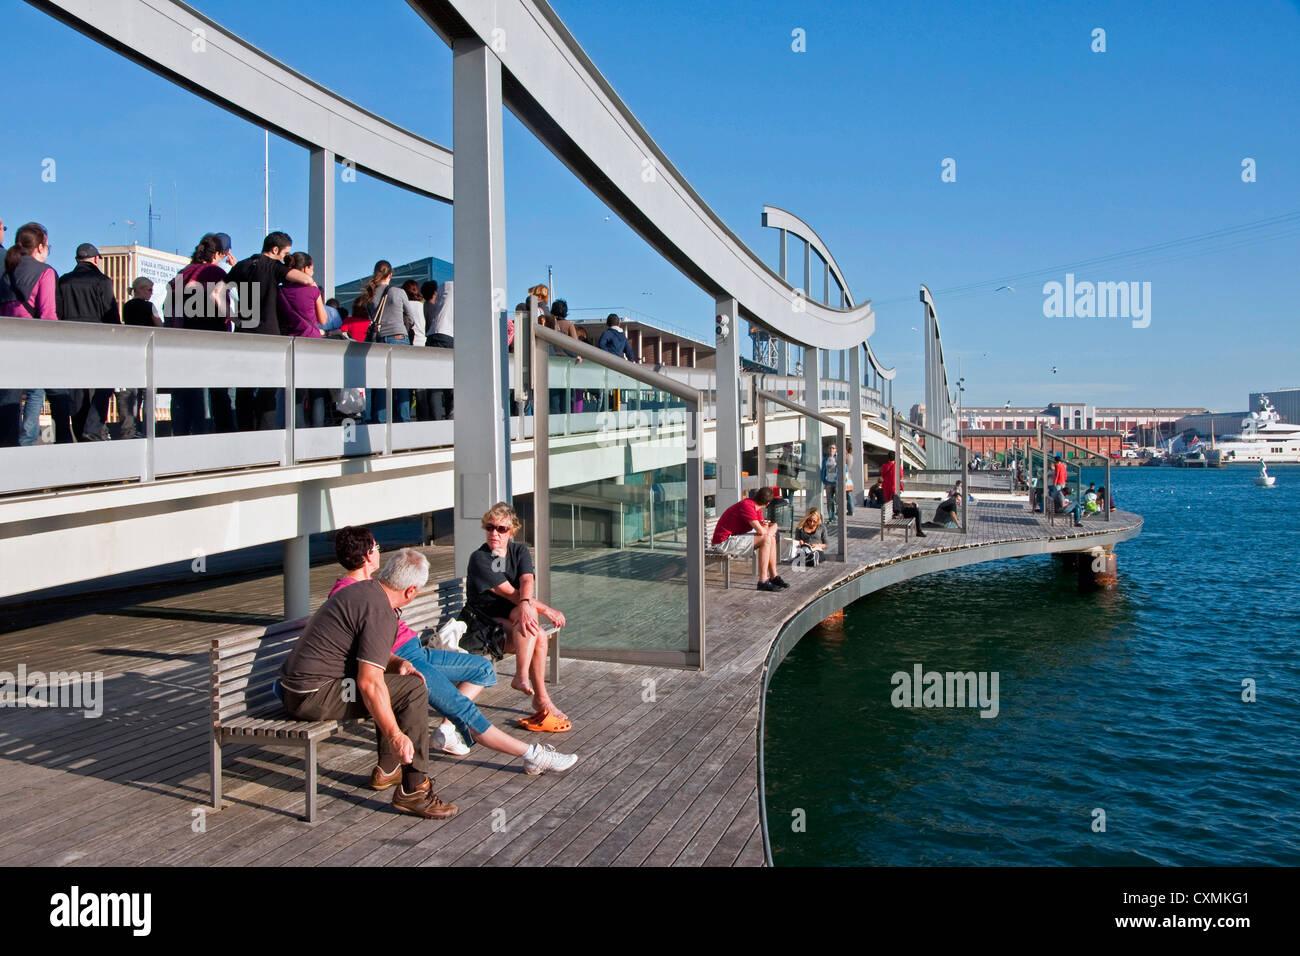 Rambla del Mar pedestrian bridge at Barcelona's Port Vell - Stock Image